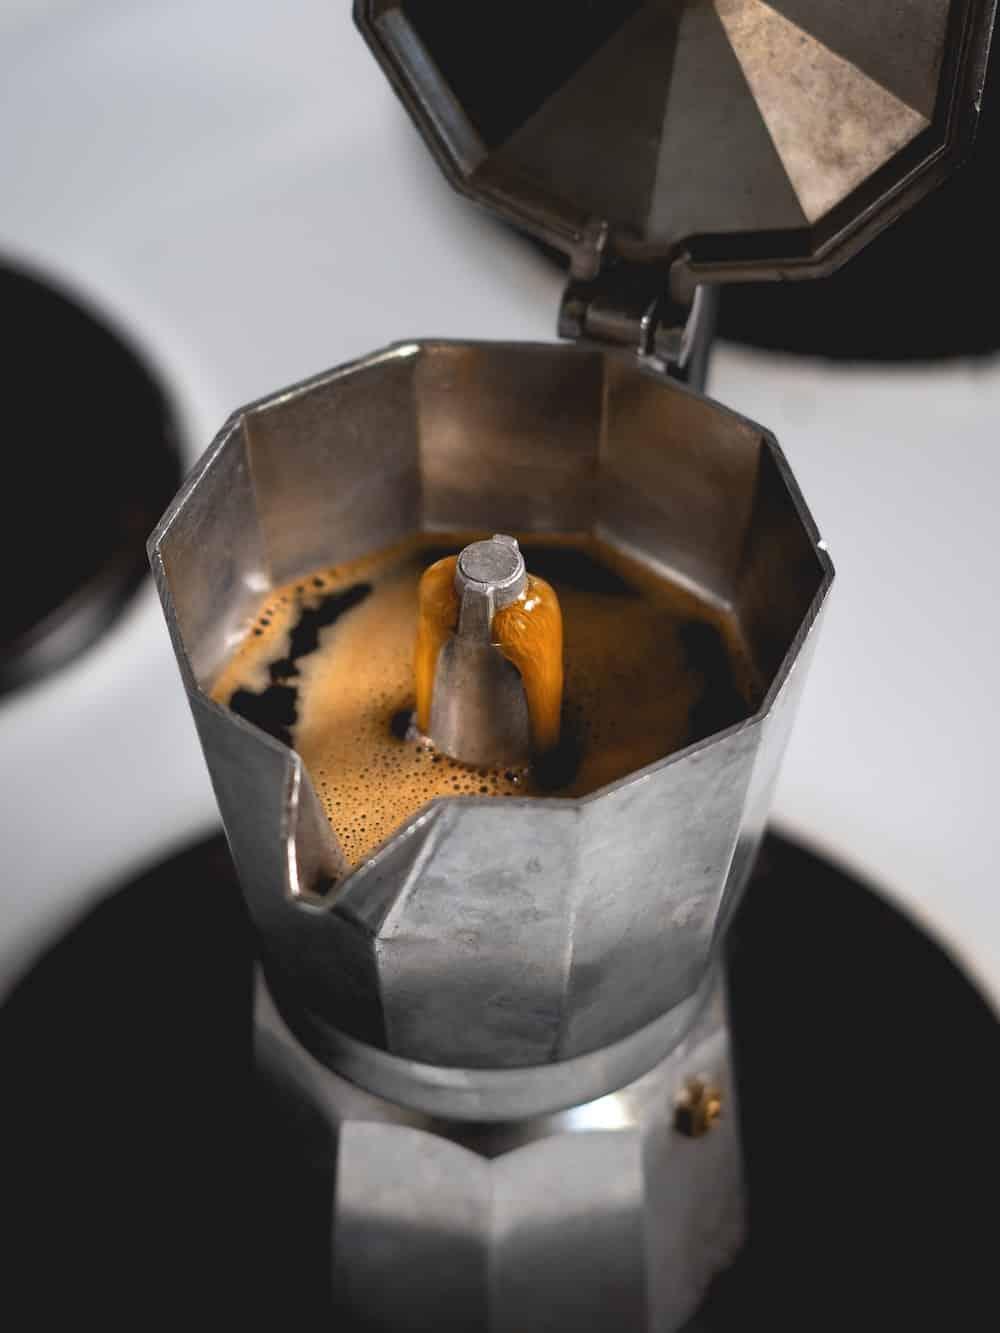 Spanish coffee maker opened